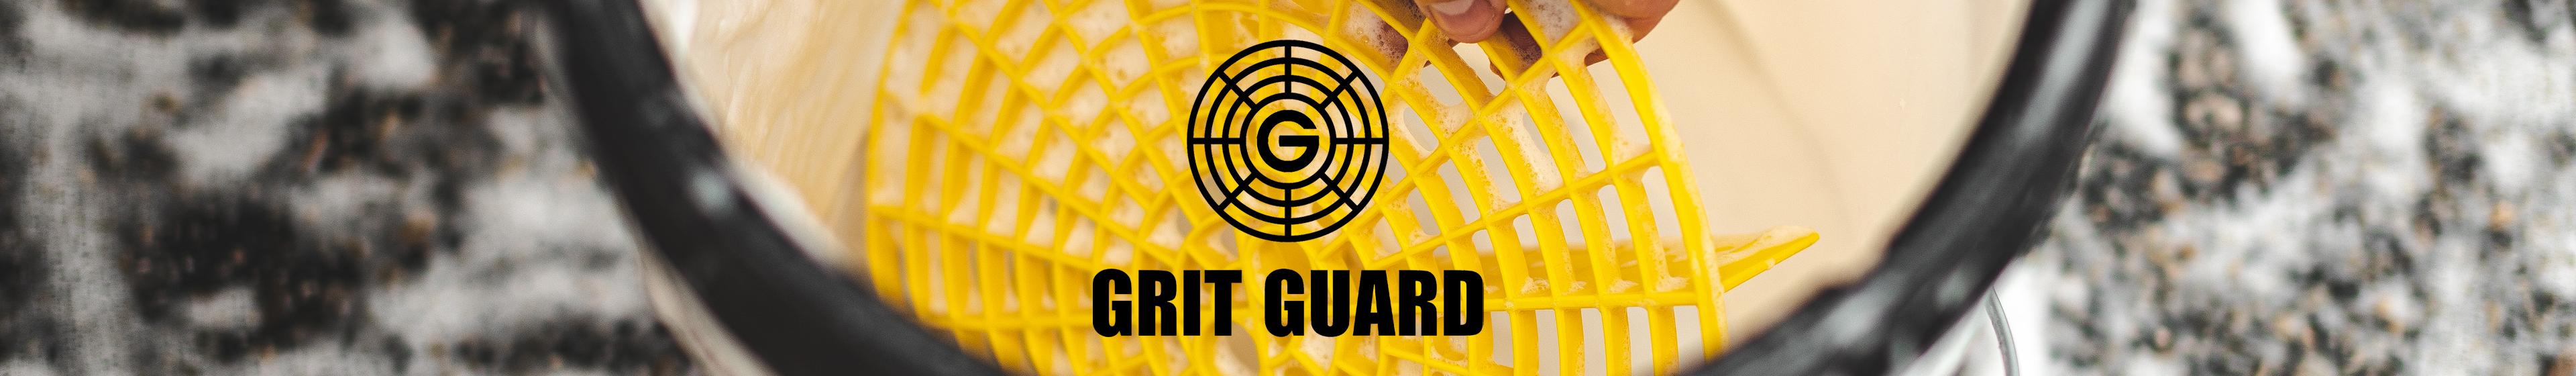 category-marketing-banner-brands-grit-guard.jpg